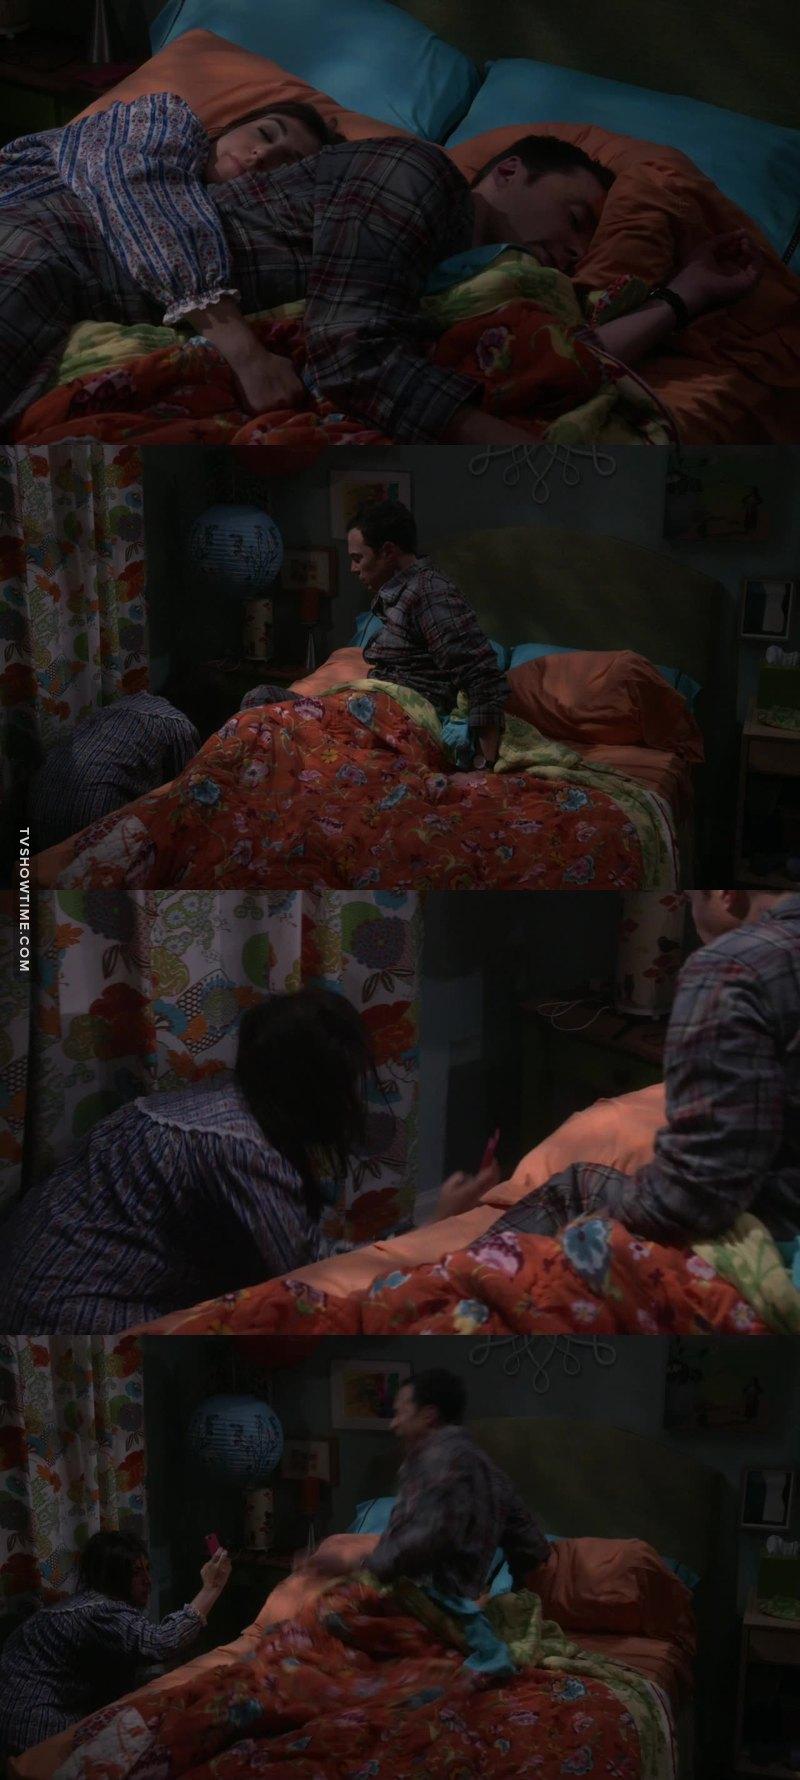 Geez Sheldon! That scream tho 📸😂